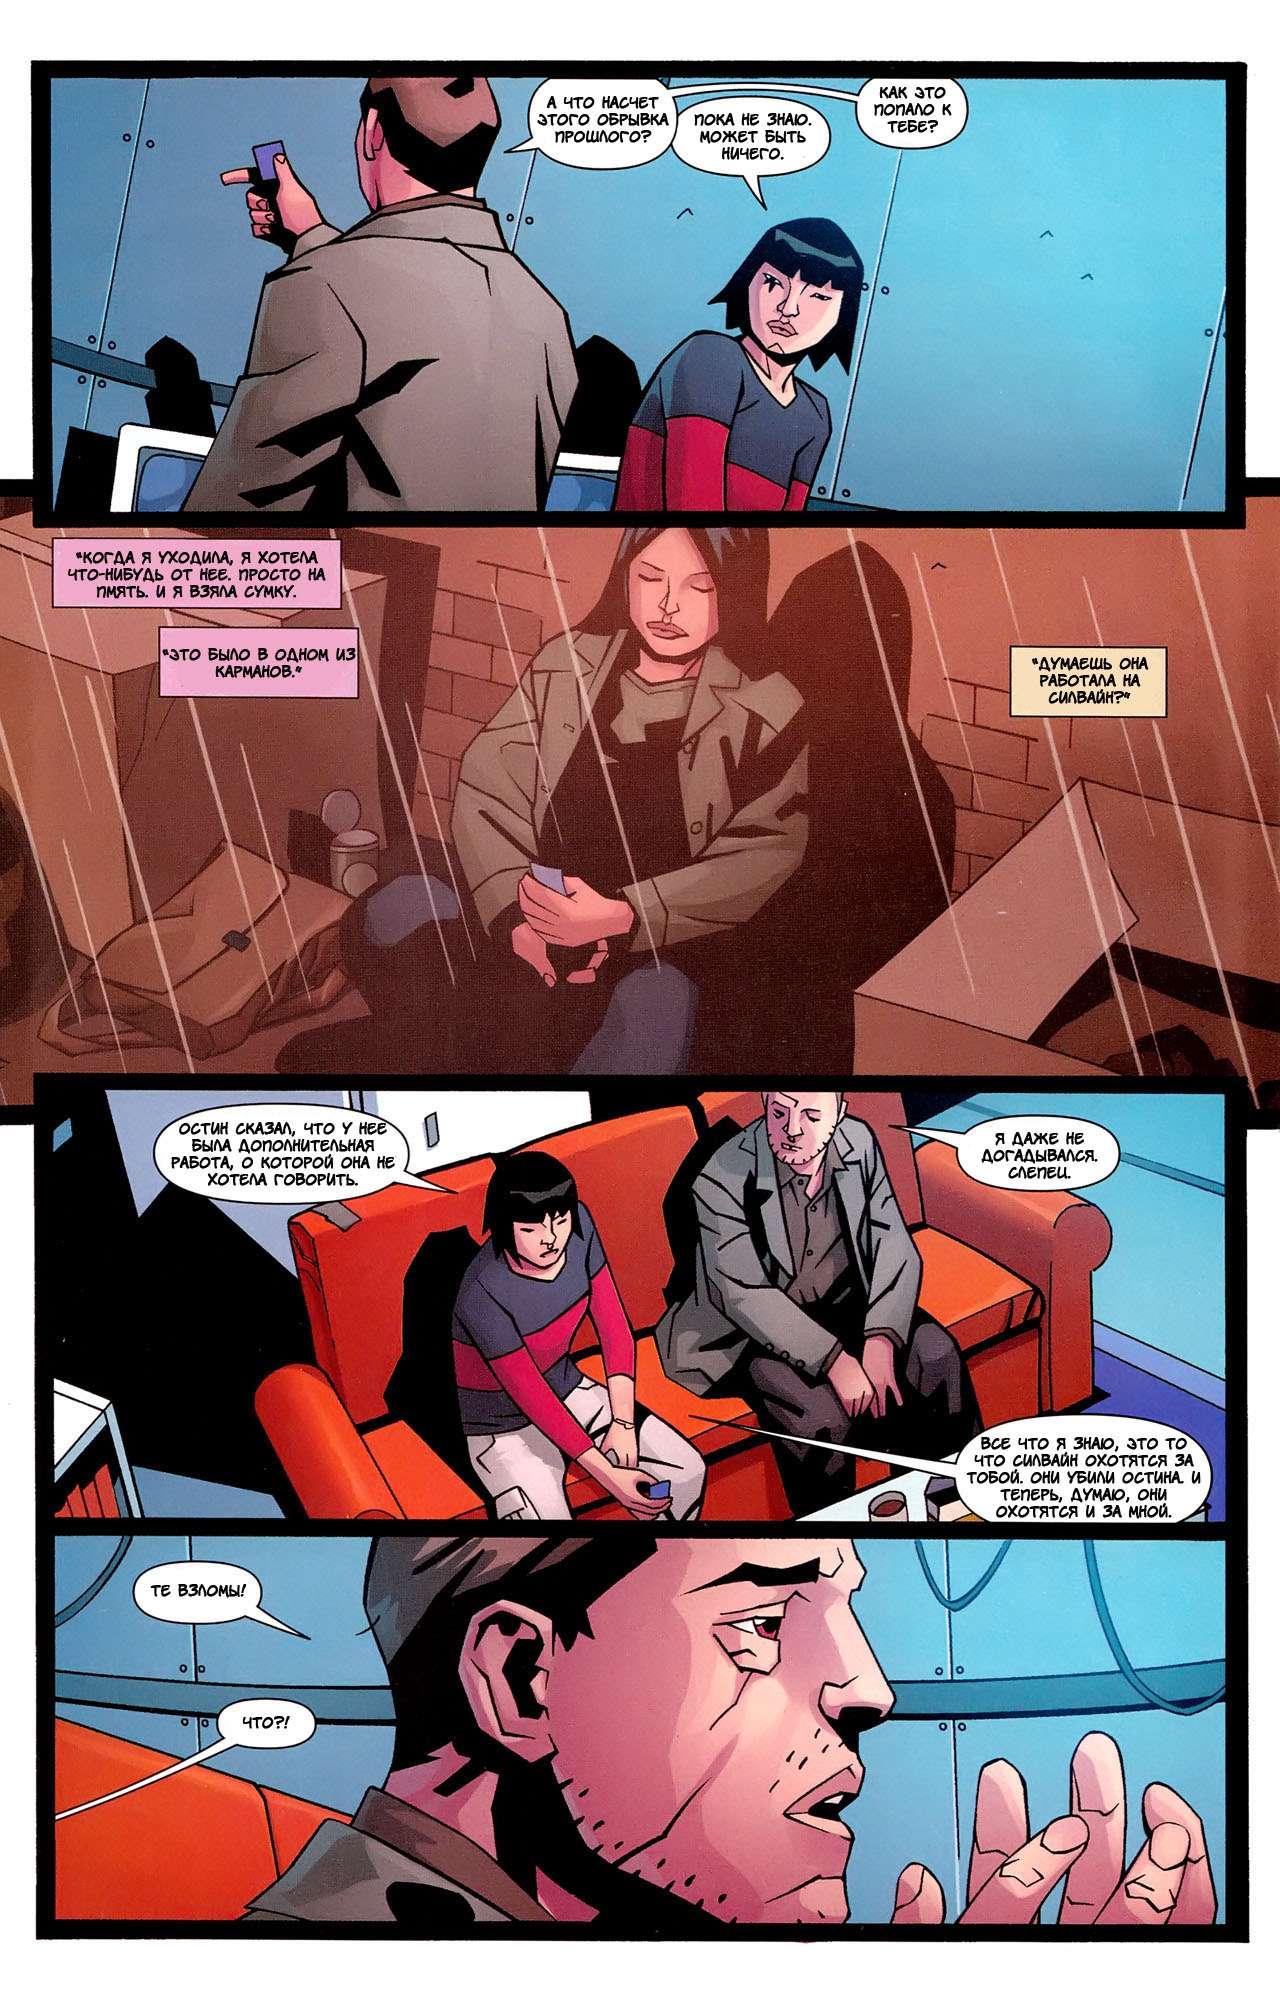 mirrors-edge-05-pg-12